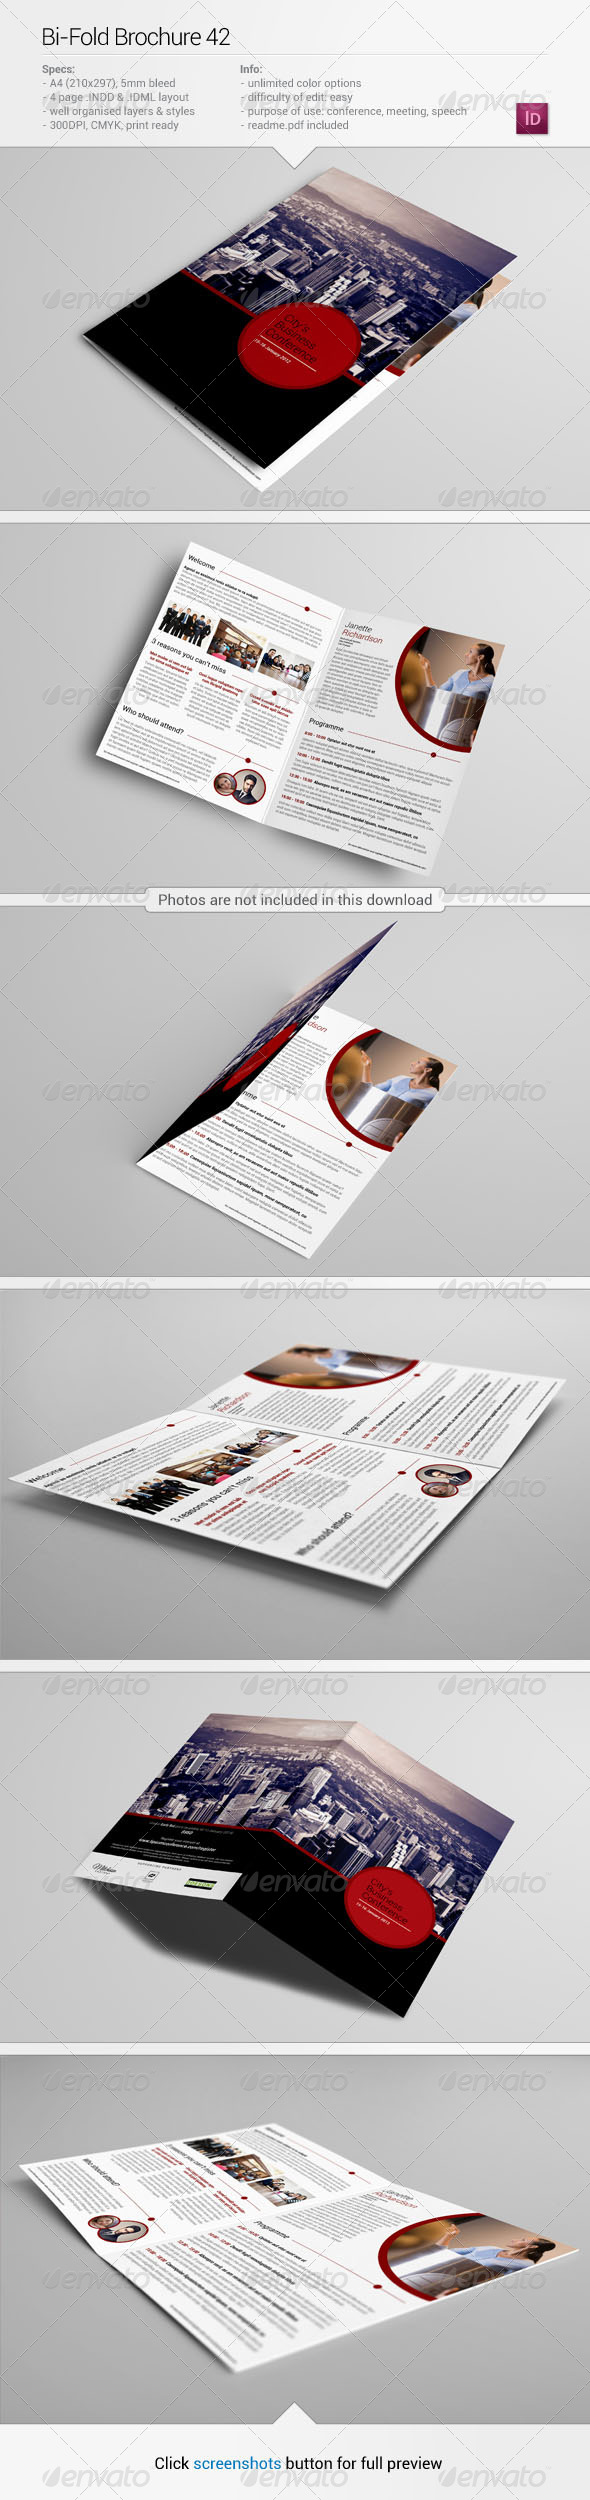 Bi-Fold Brochure 42 - Informational Brochures